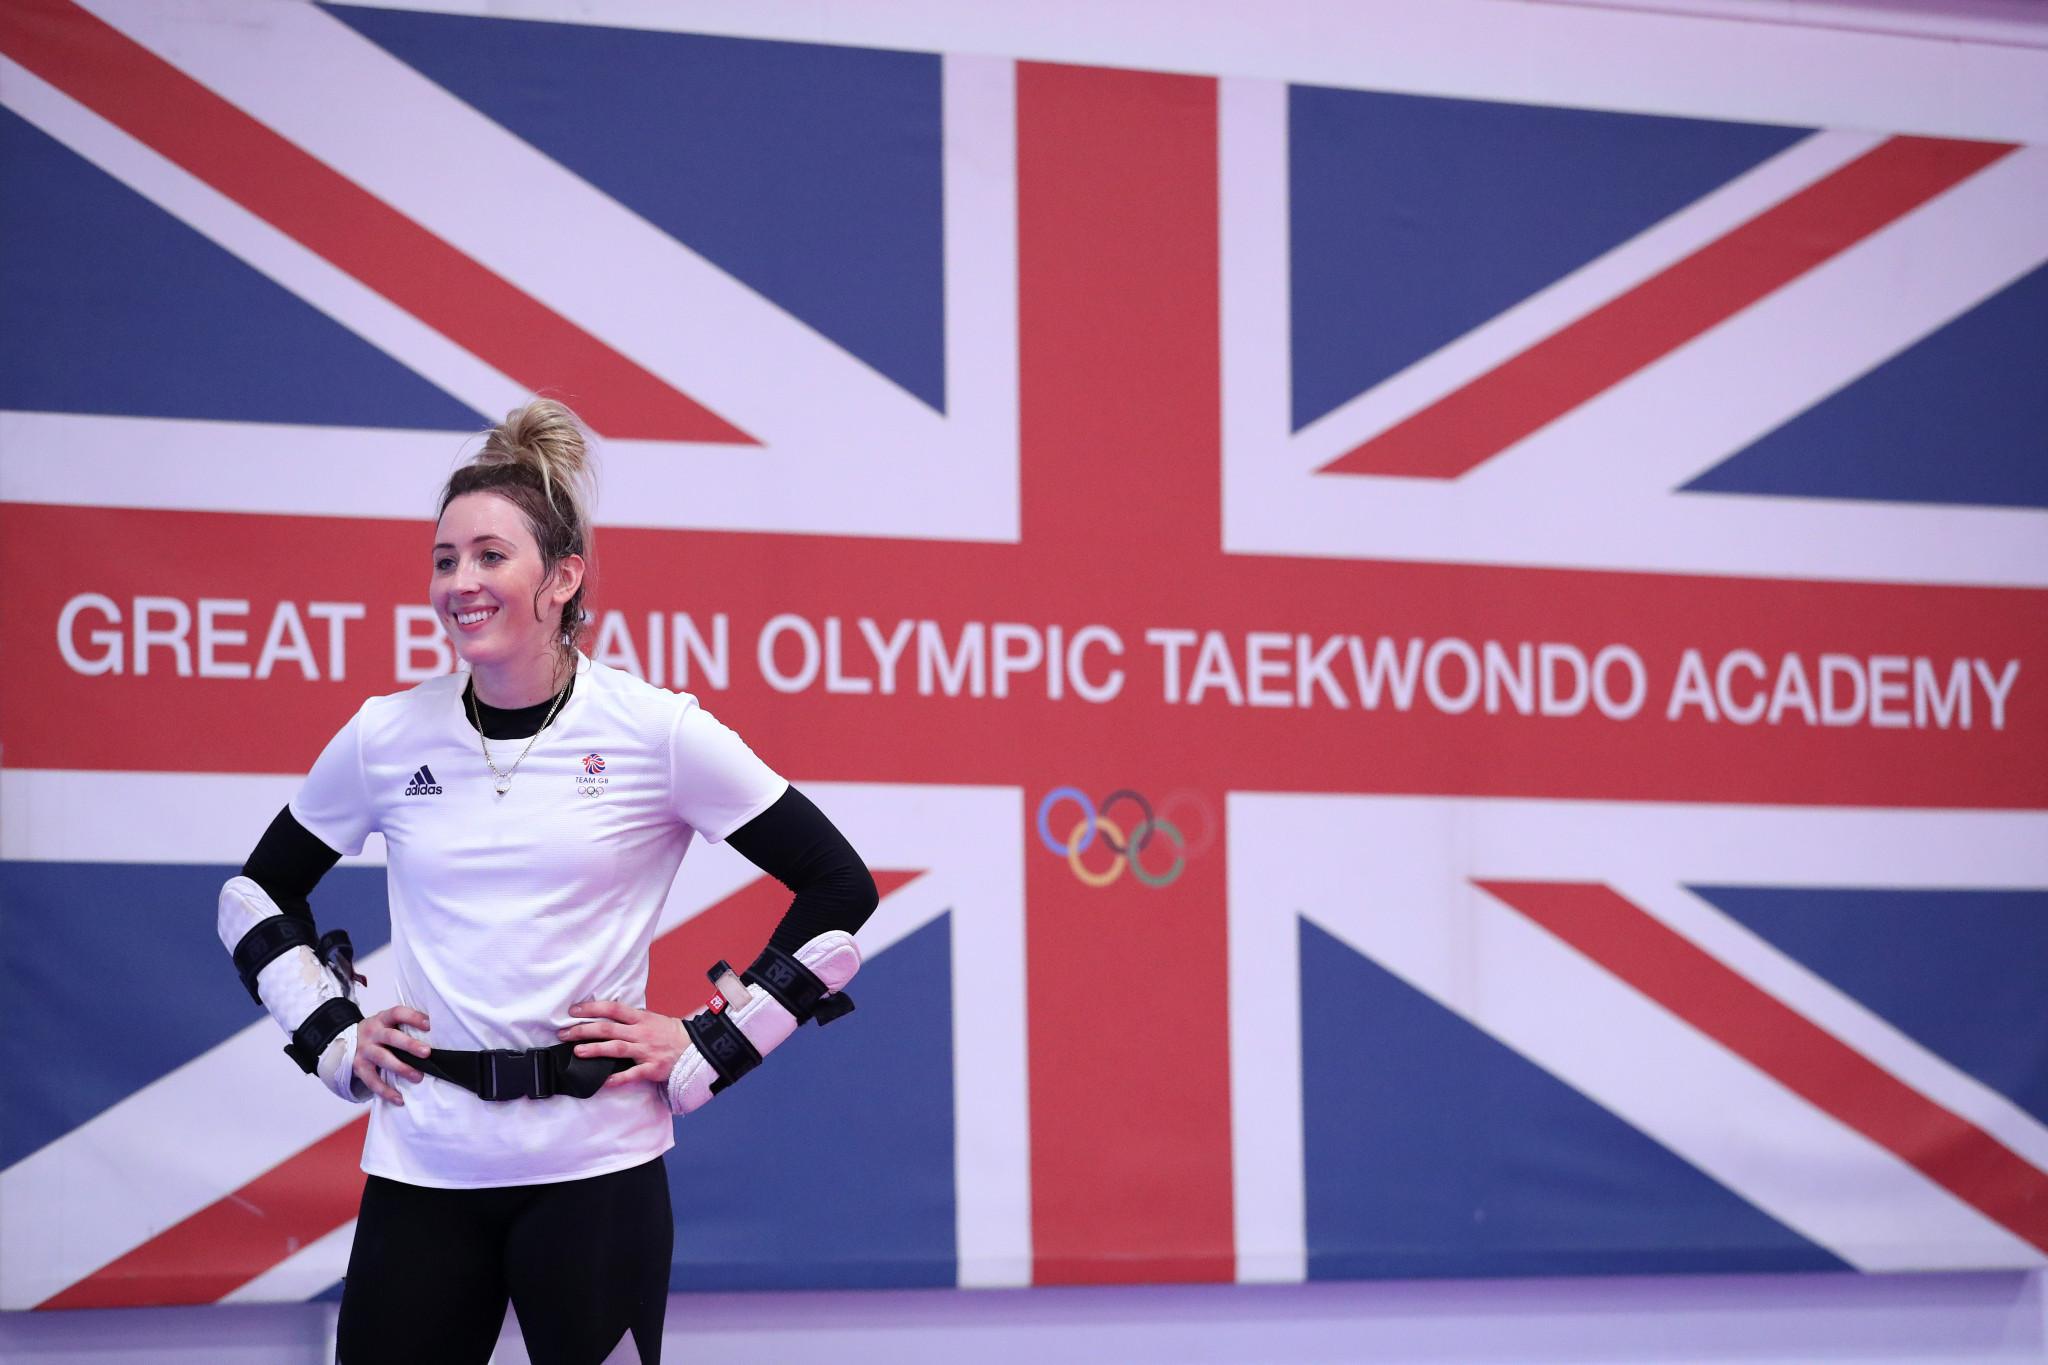 Jones and Wu target third Olympic taekwondo titles at Tokyo 2020